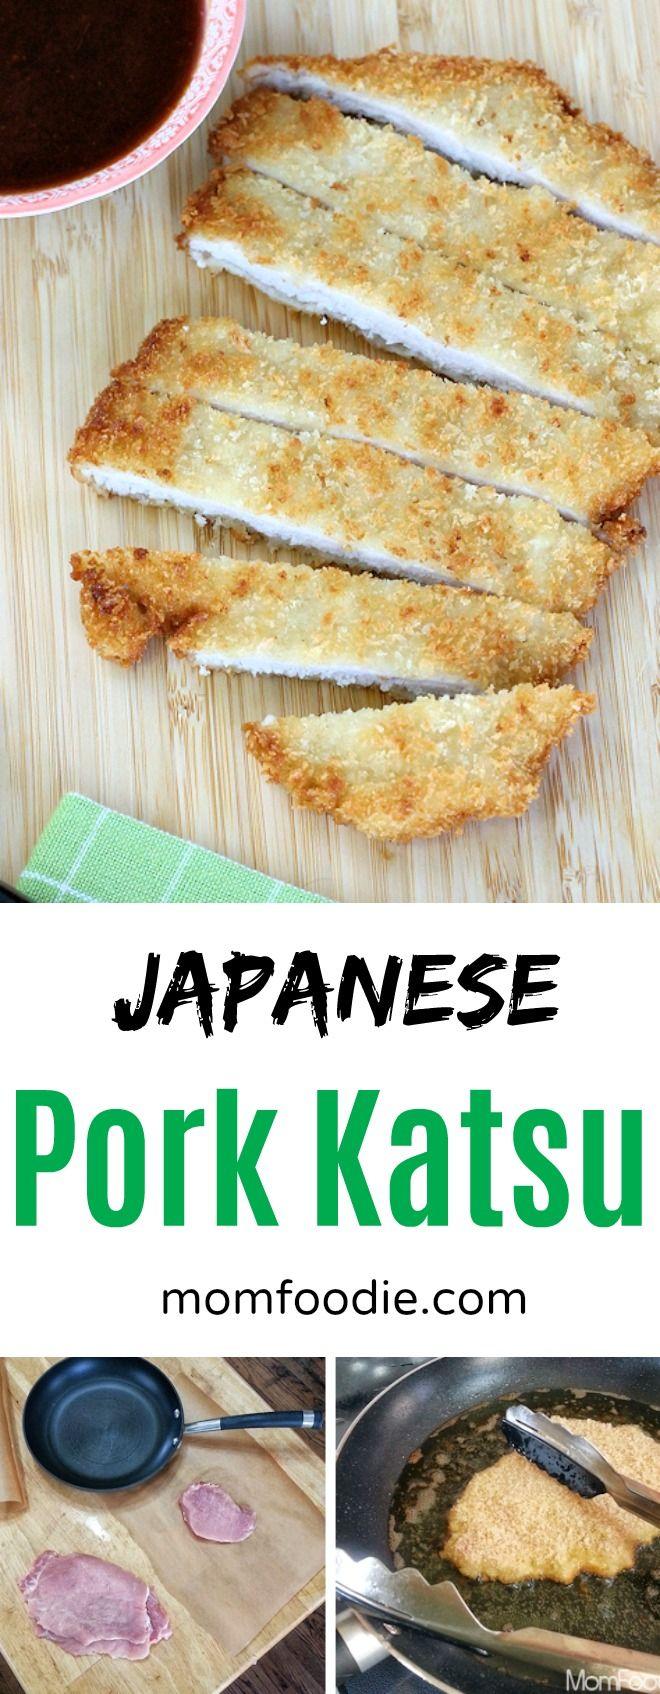 Pork Katsu Recipe : Easy Japanese Pork Tonkatsu Breaded Cutlets with Katsu sauce, kids will love. #japanesefood #porkrecipes via @MomFoodie